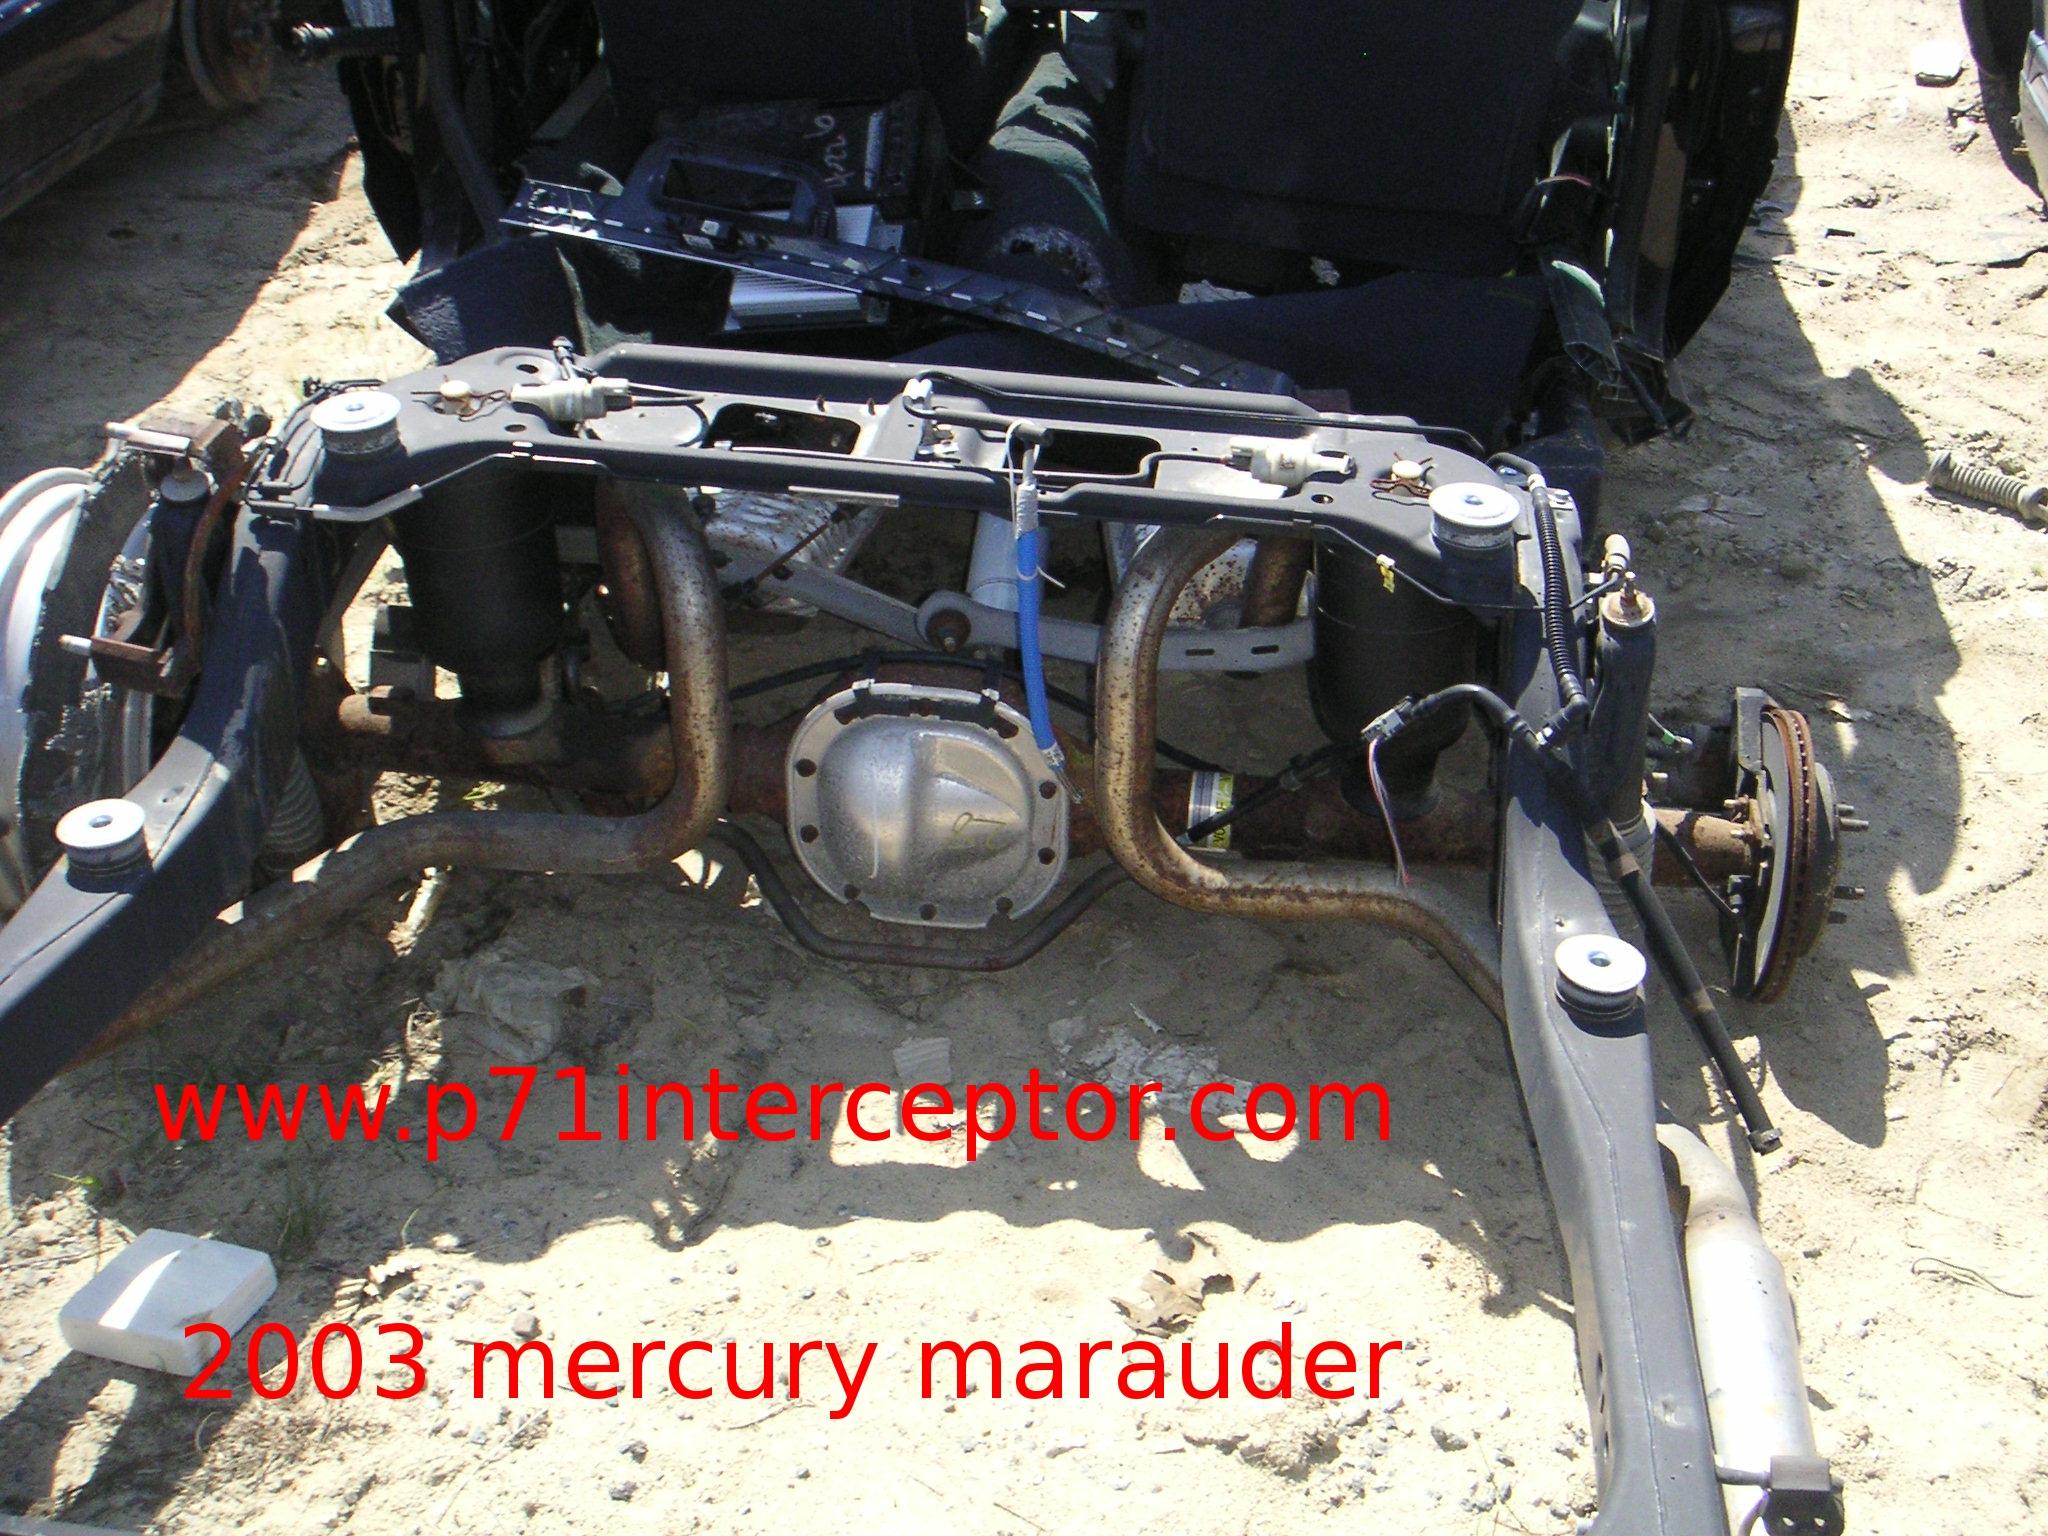 1996 ford ranger front suspension diagram cat5e wiring crown victoria auto